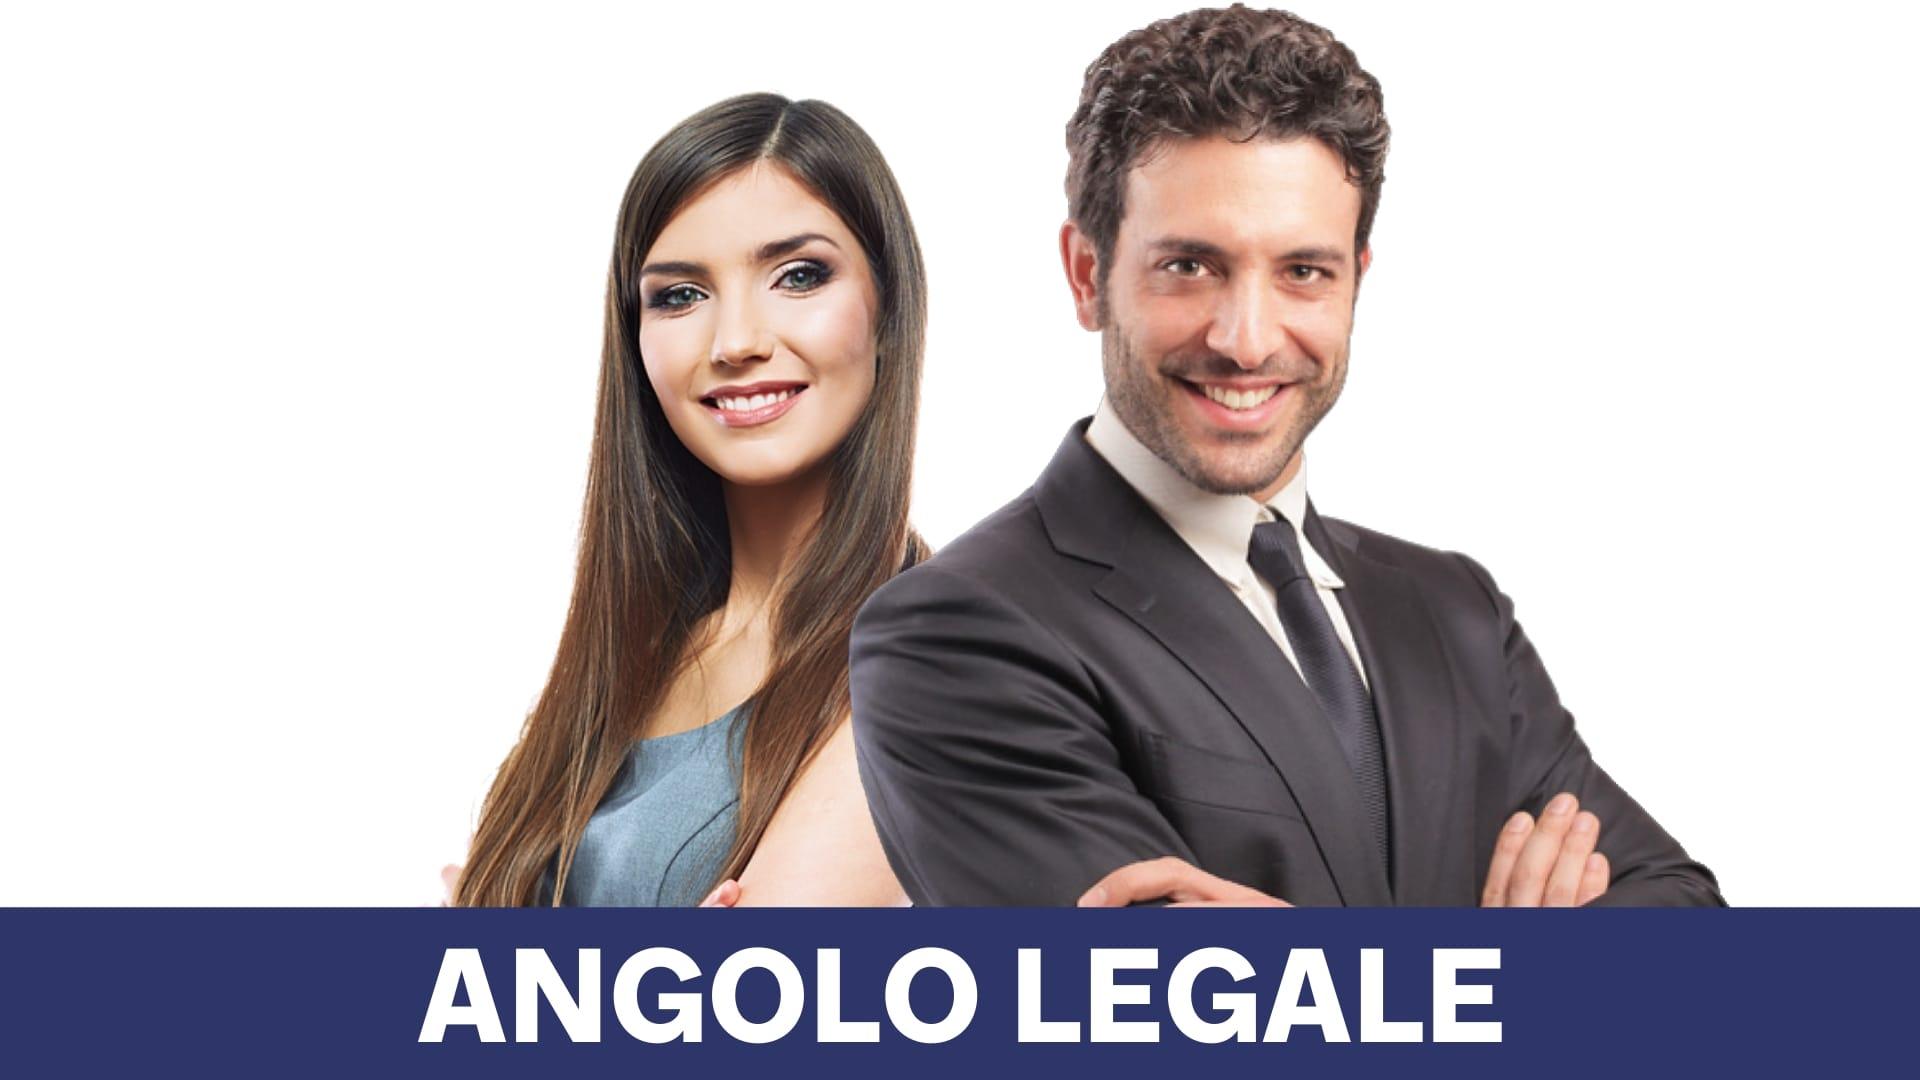 Angolo Legale FIAP  v3